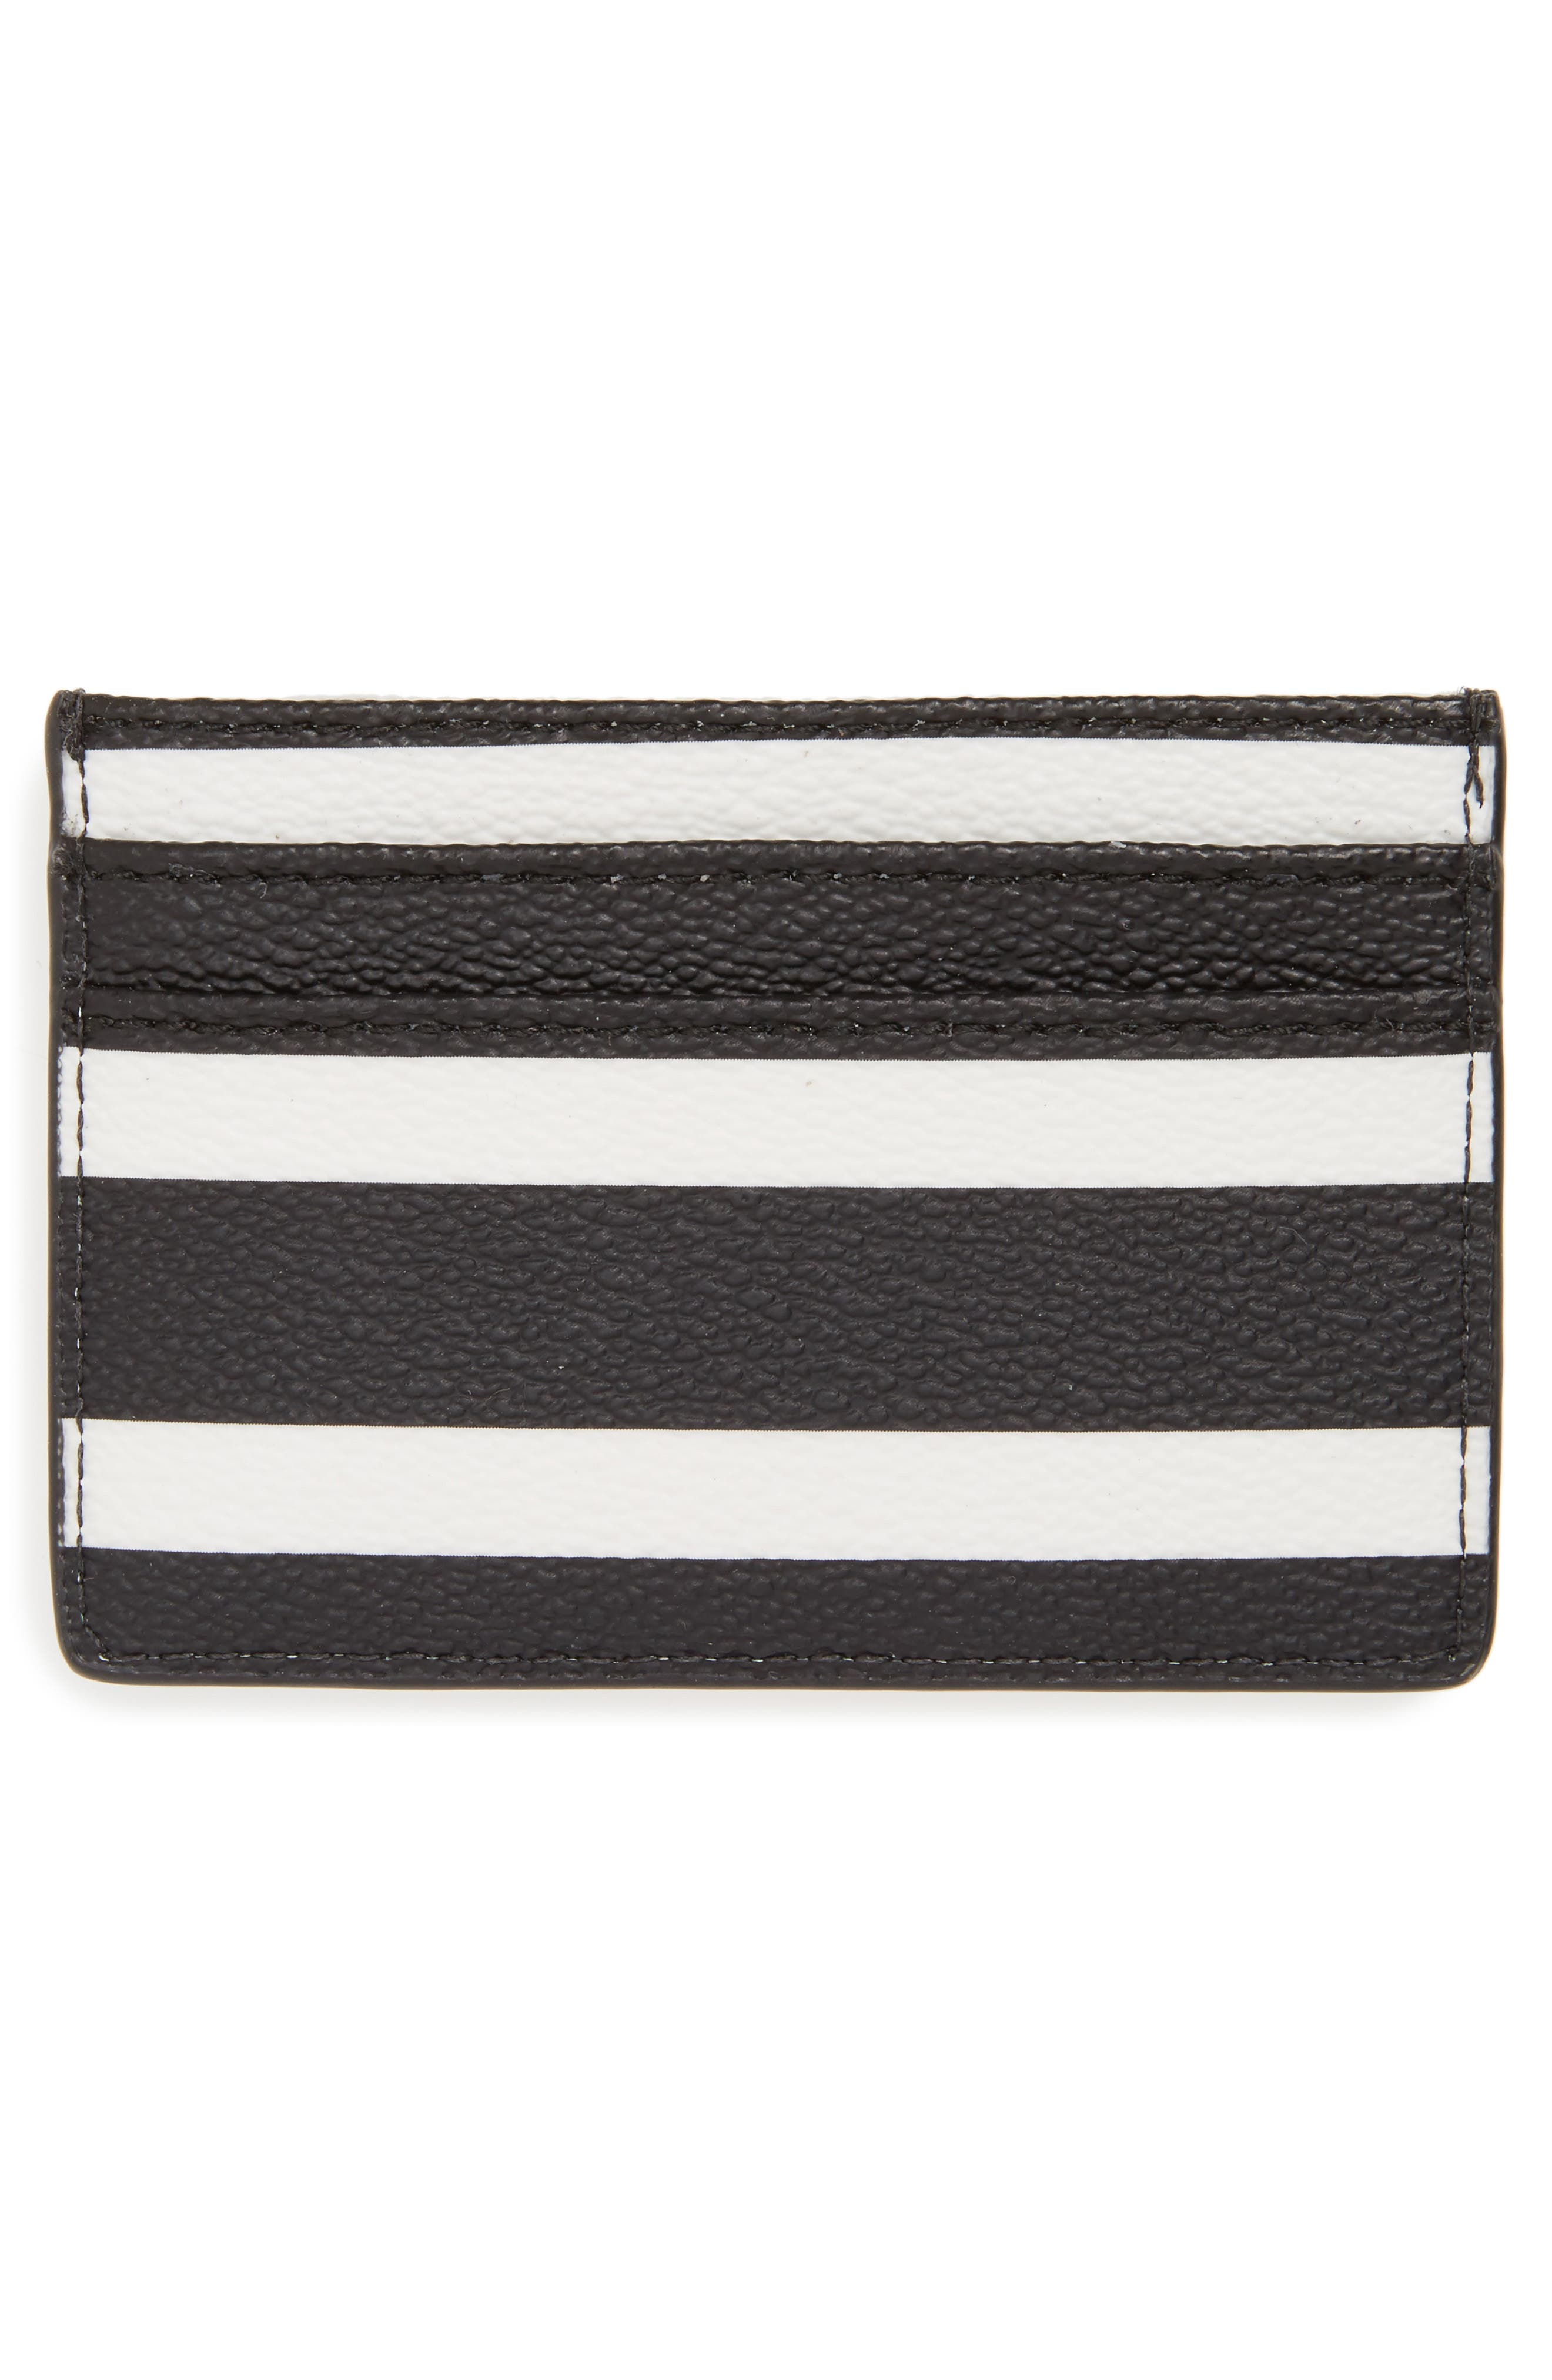 hyde lane stripe card case,                             Alternate thumbnail 2, color,                             Black/ Cream